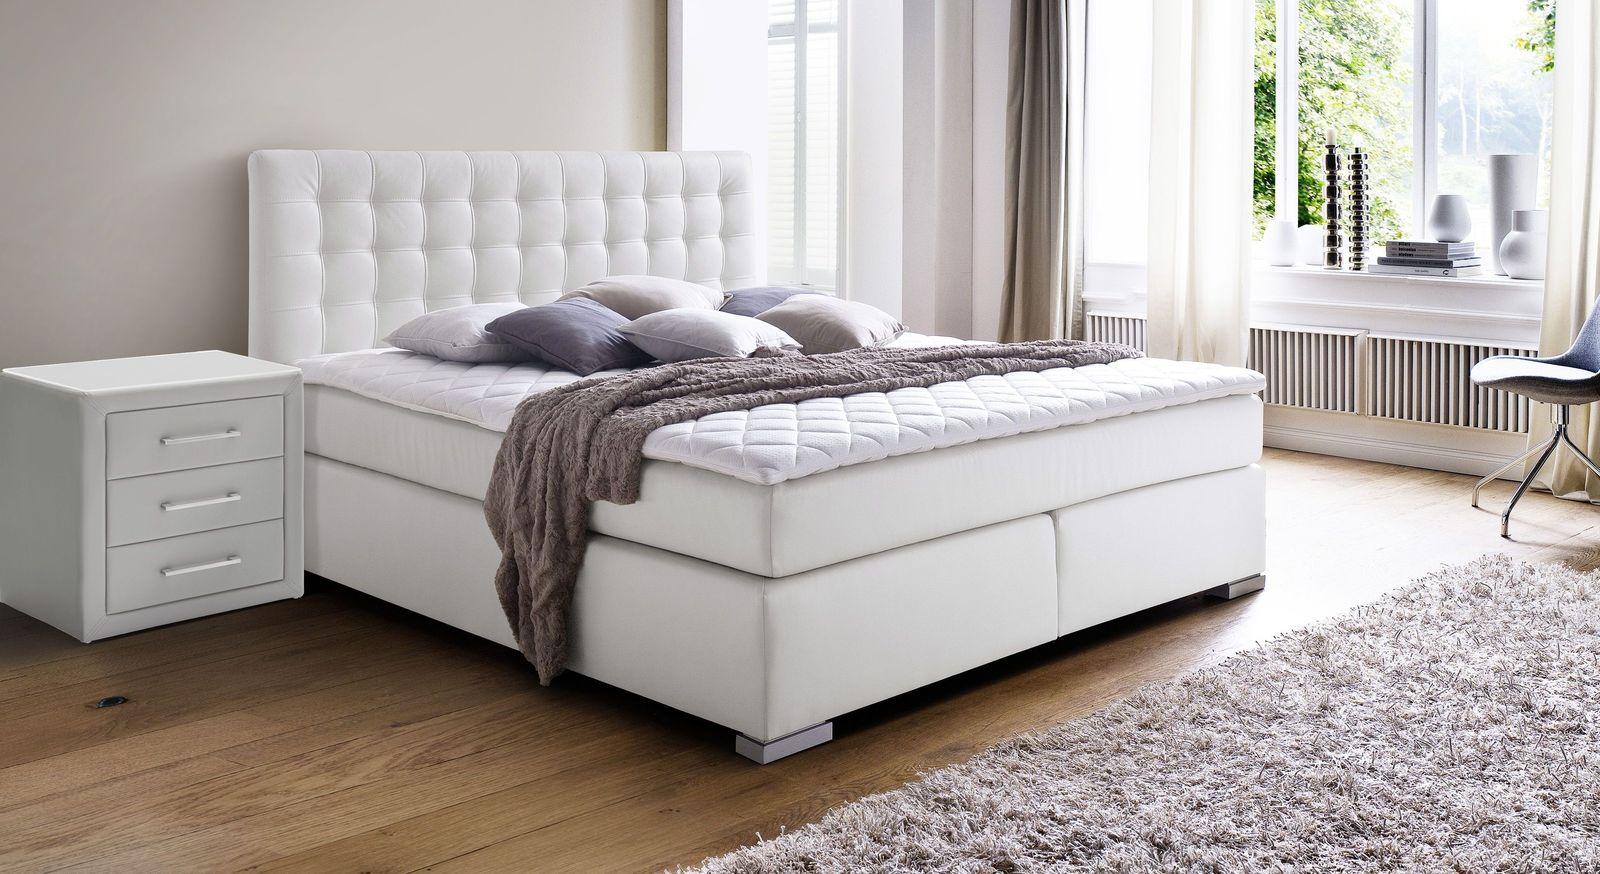 Boxspringbett Taimea aus weißem Kunstleder